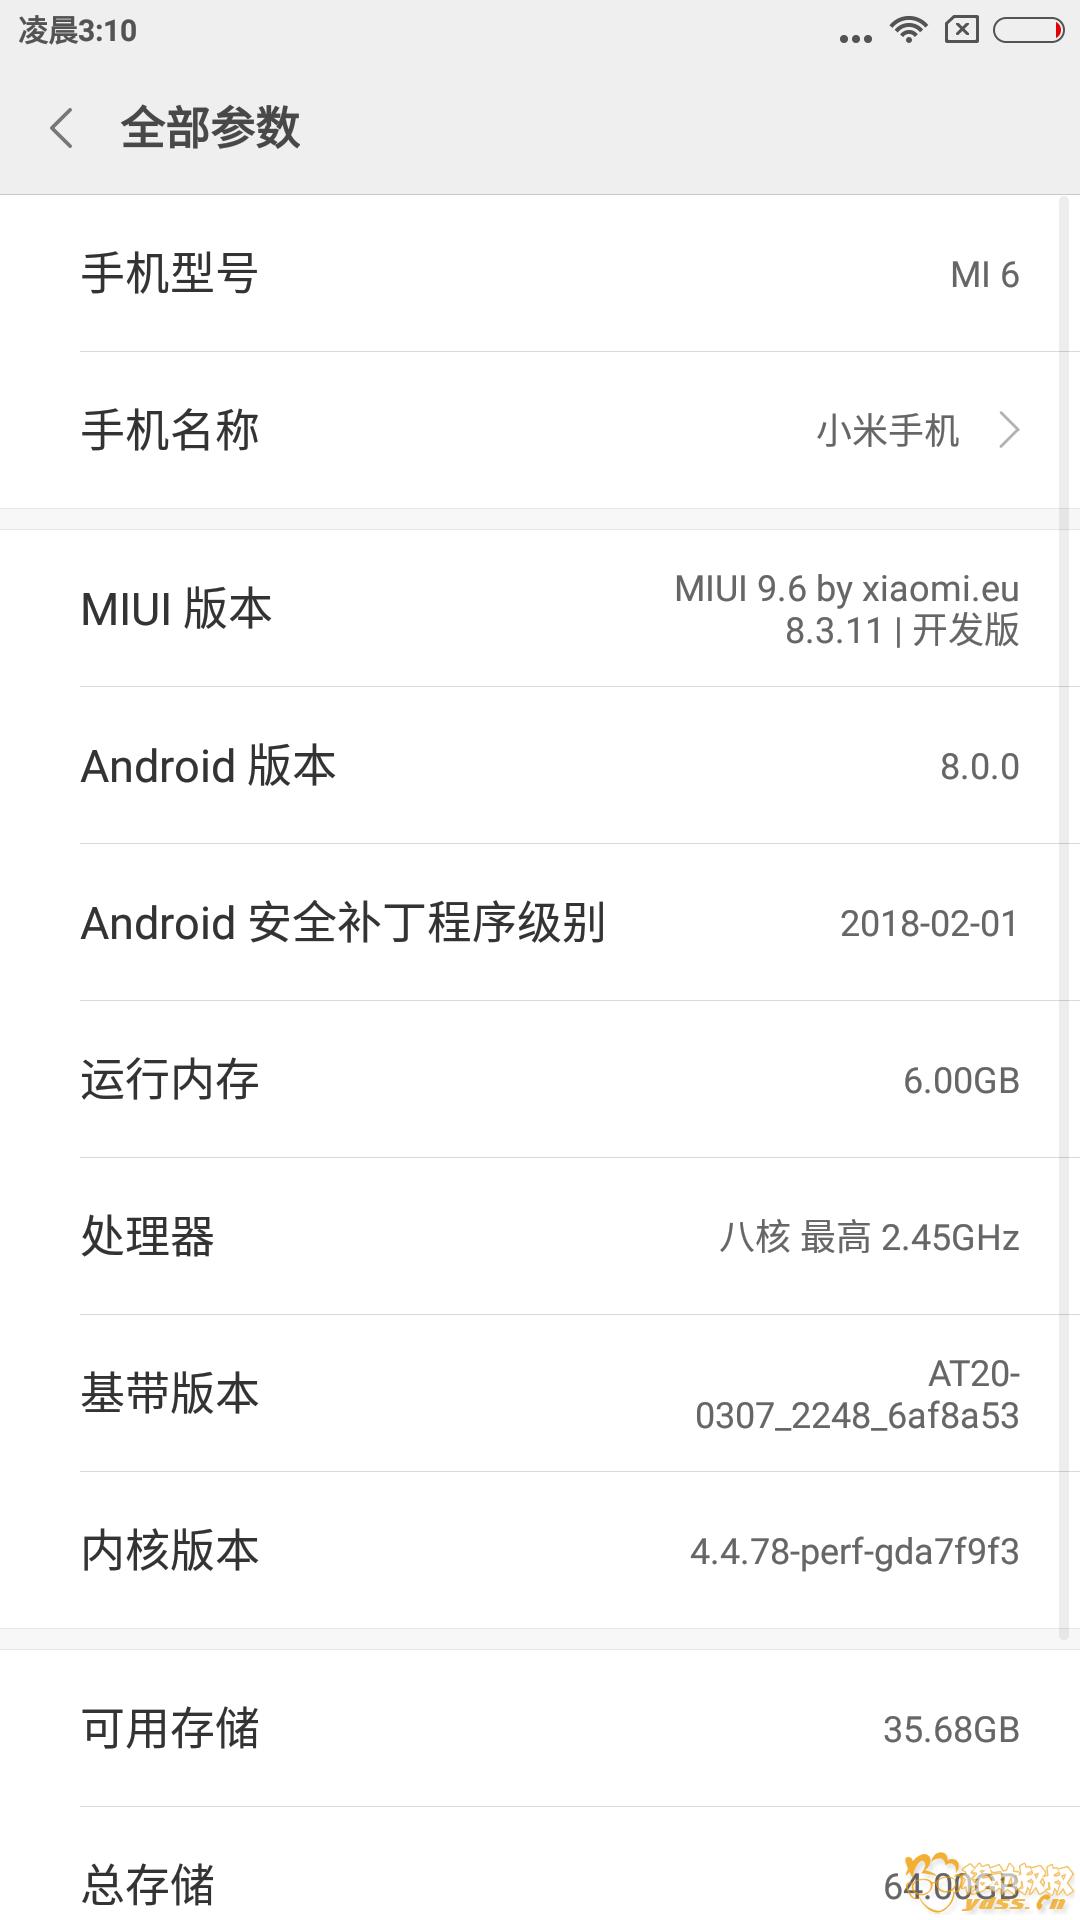 Screenshot_2018-03-11-03-10-29-465_com.android.se.png